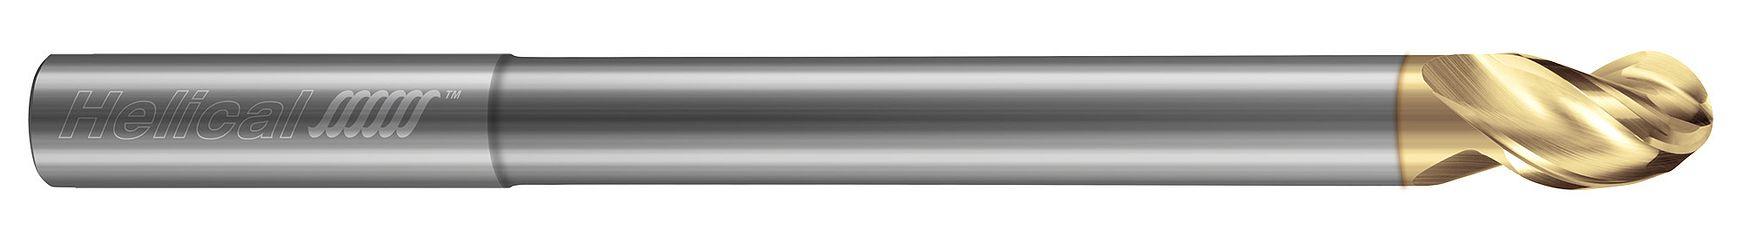 tool-details-47481